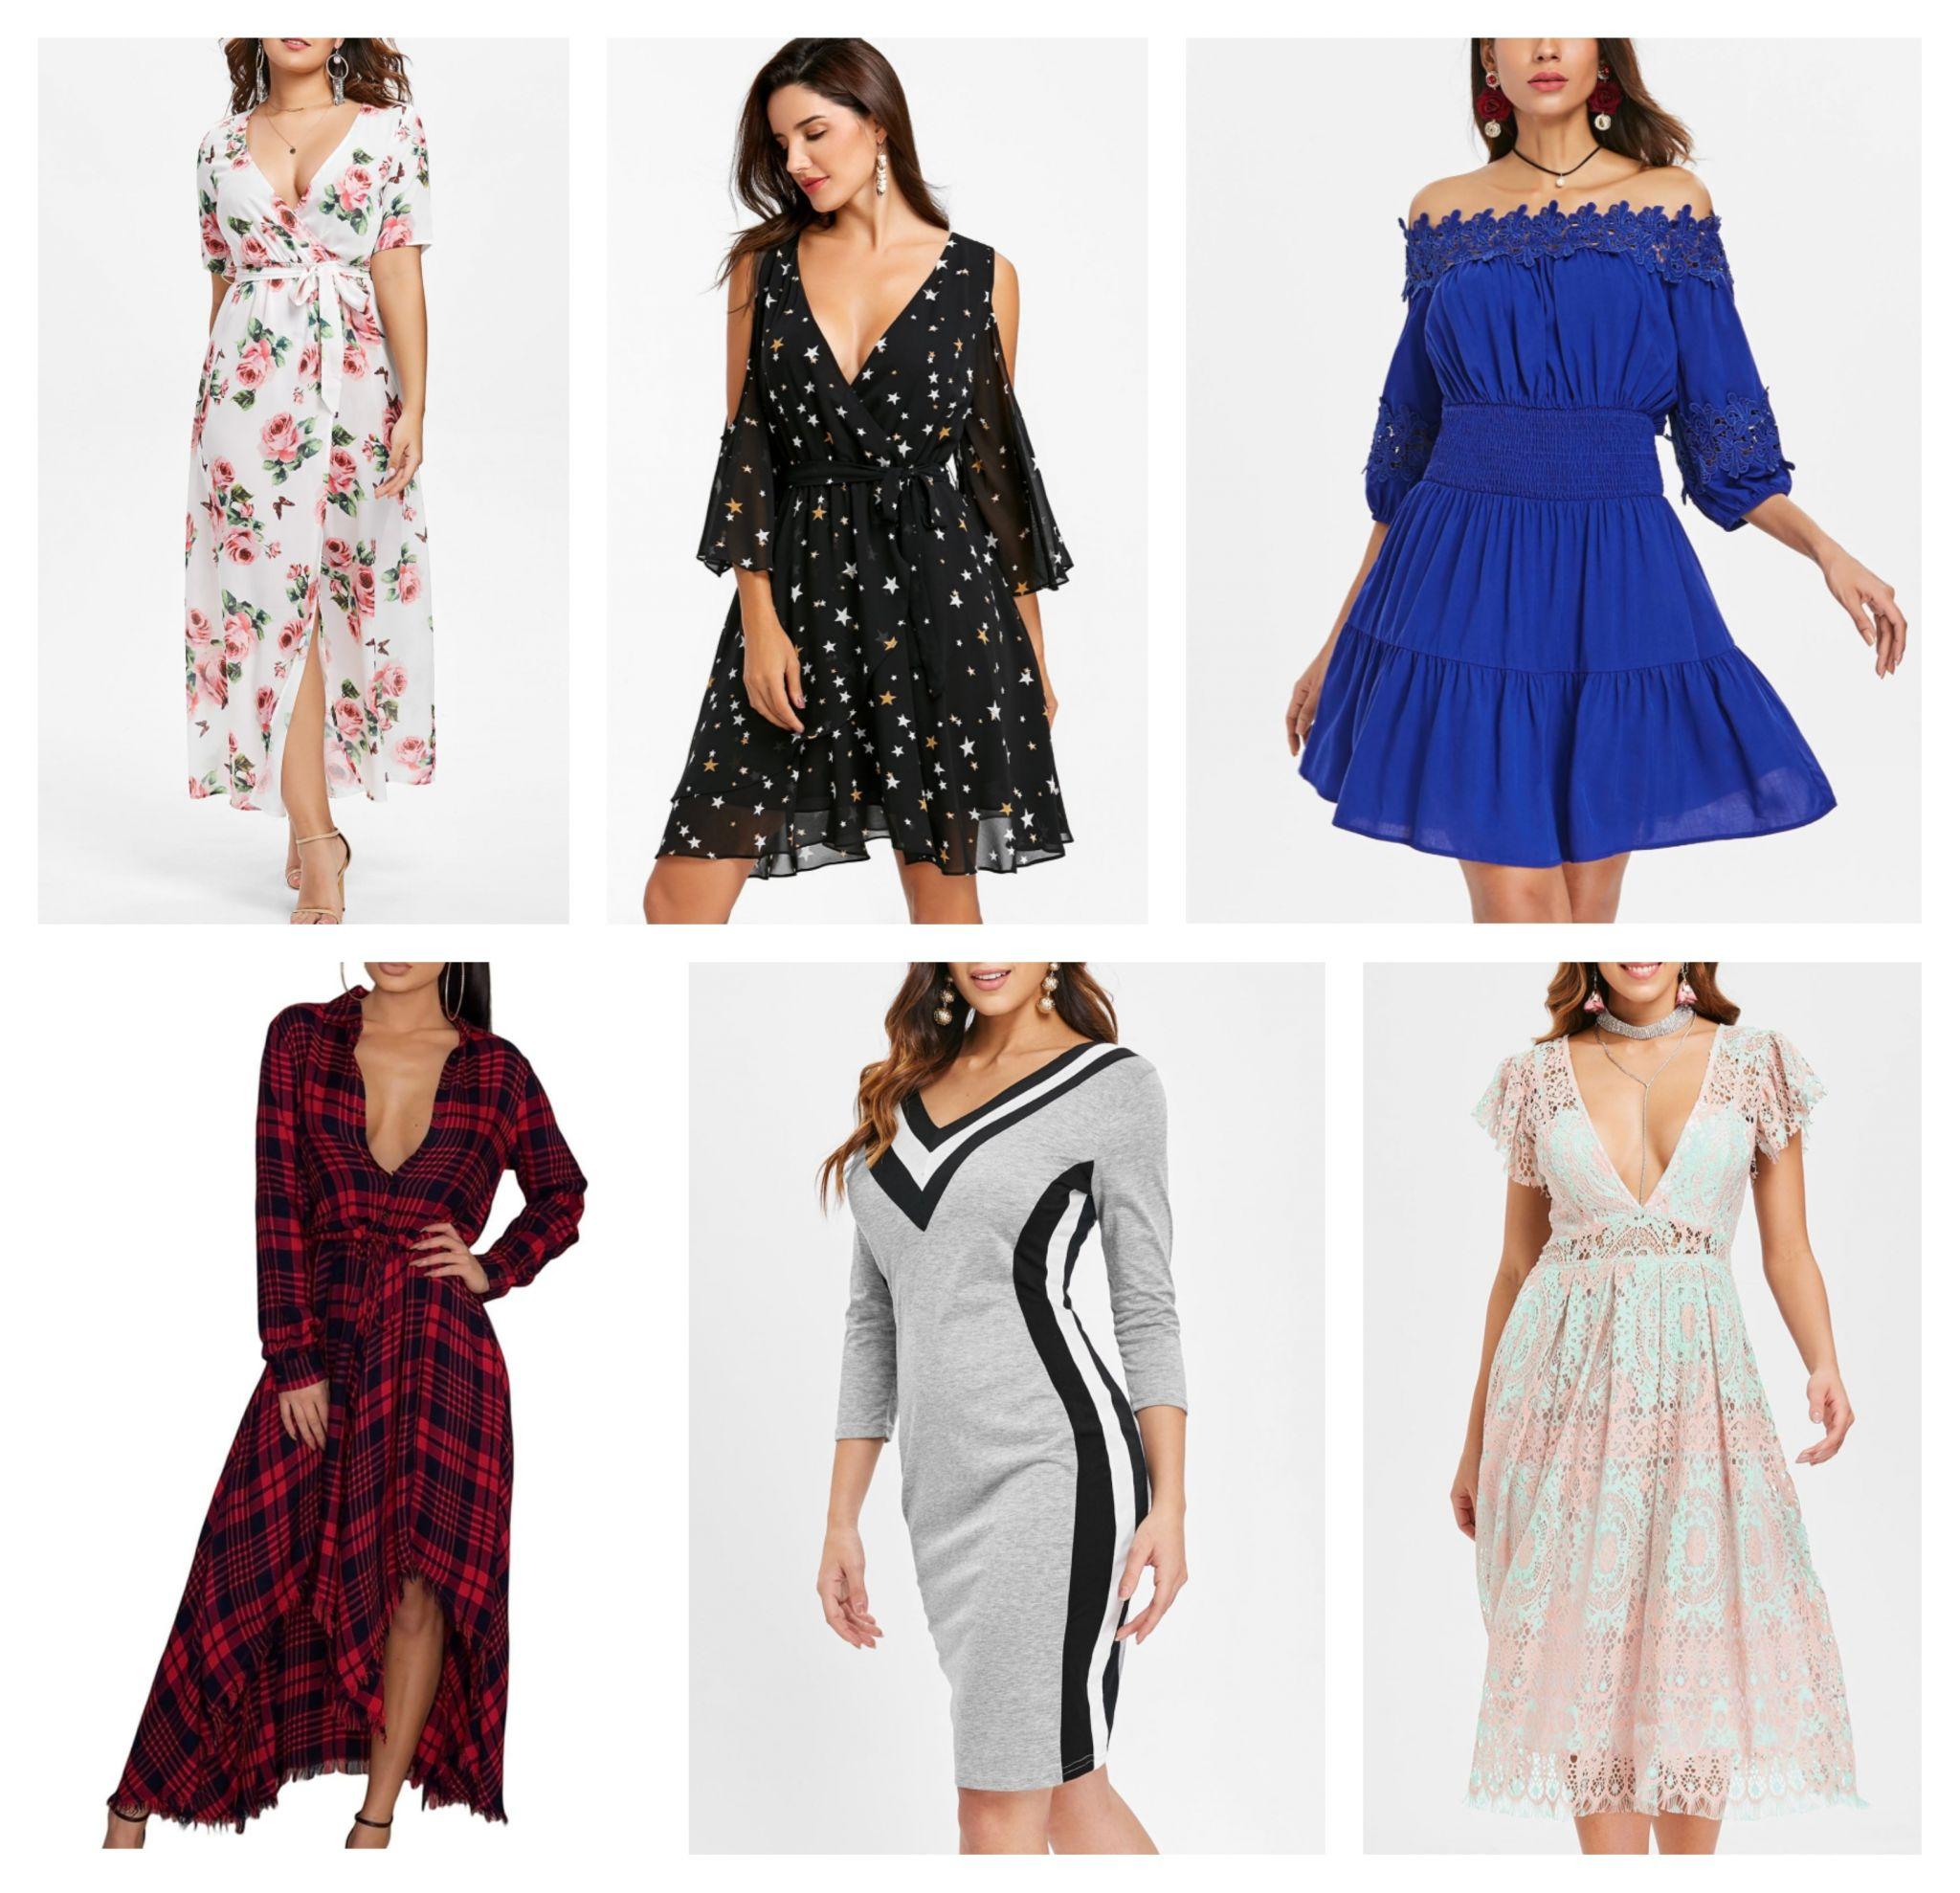 spring-ready dresses